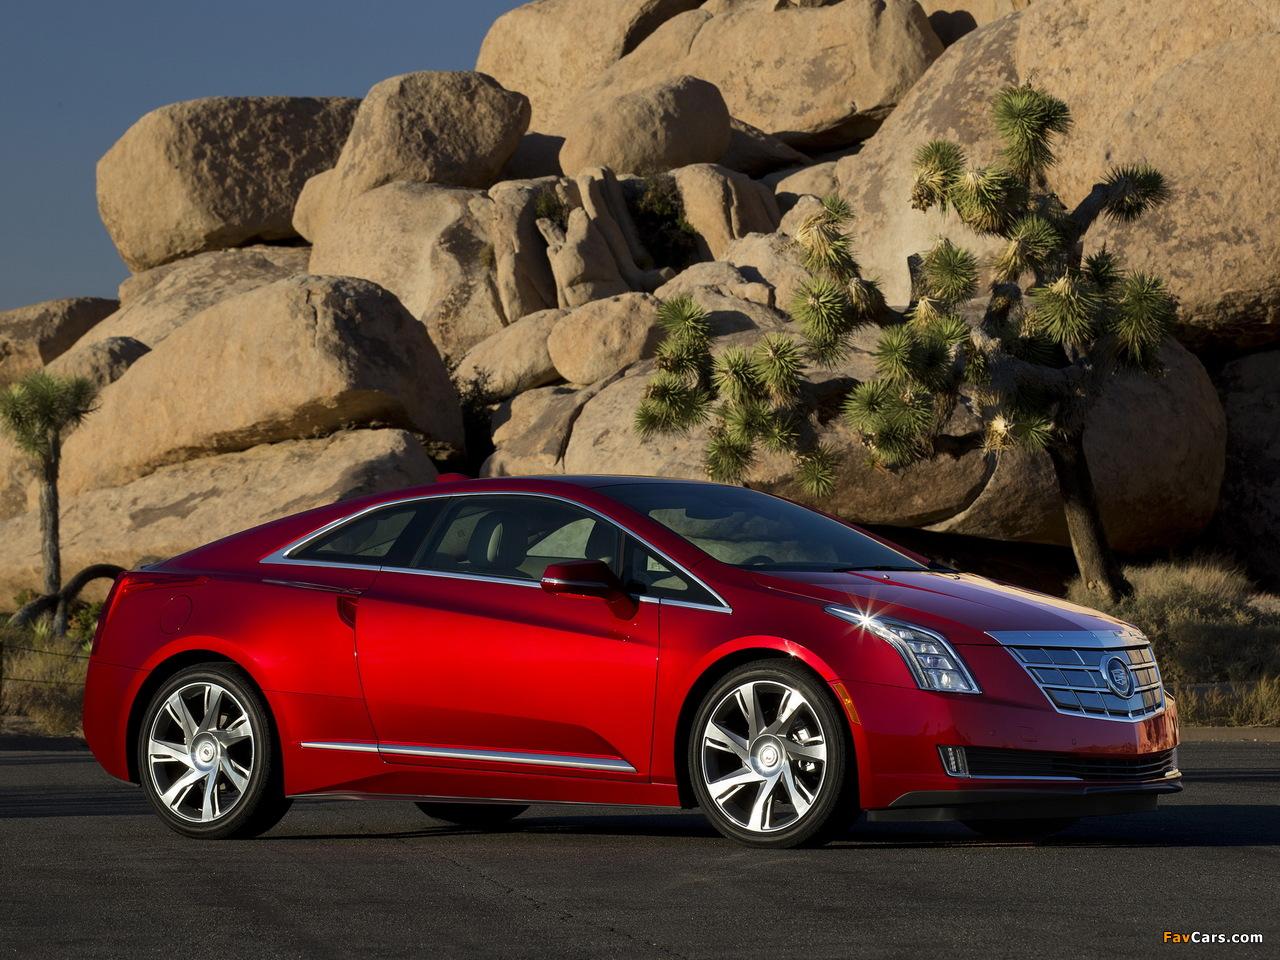 Cadillac ELR 2014 images (1280 x 960)